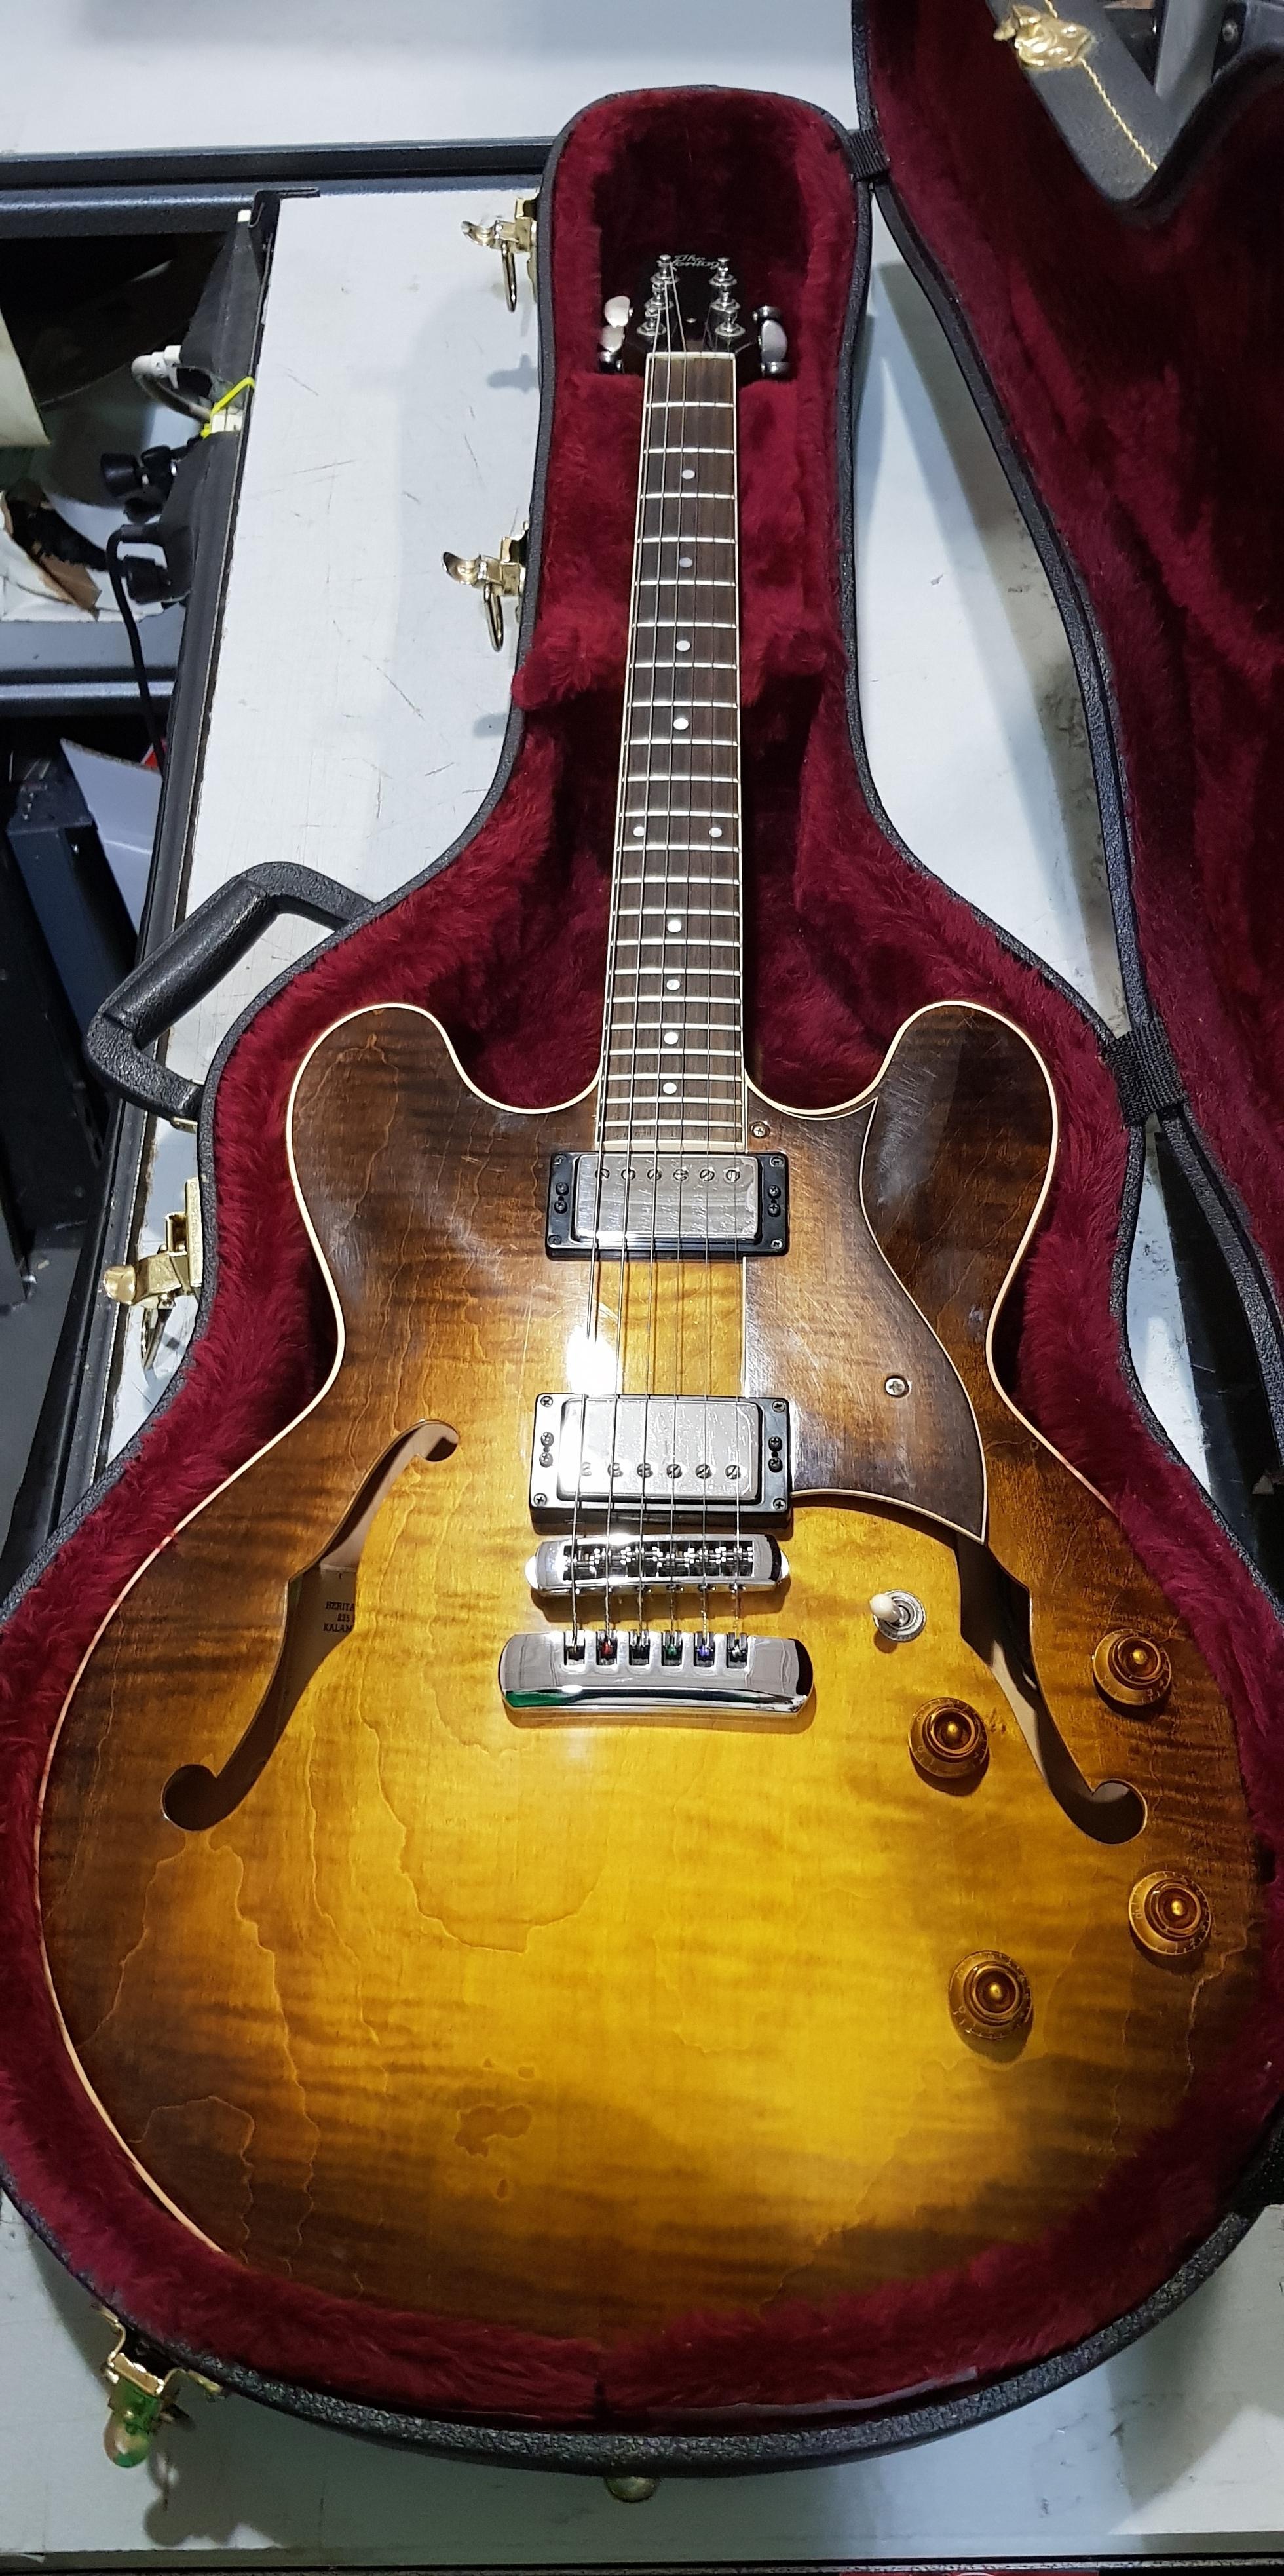 1996 HERITAGE H-535 Semi-Hollow Body Electric Guitar **HSC** Antique Sunburst